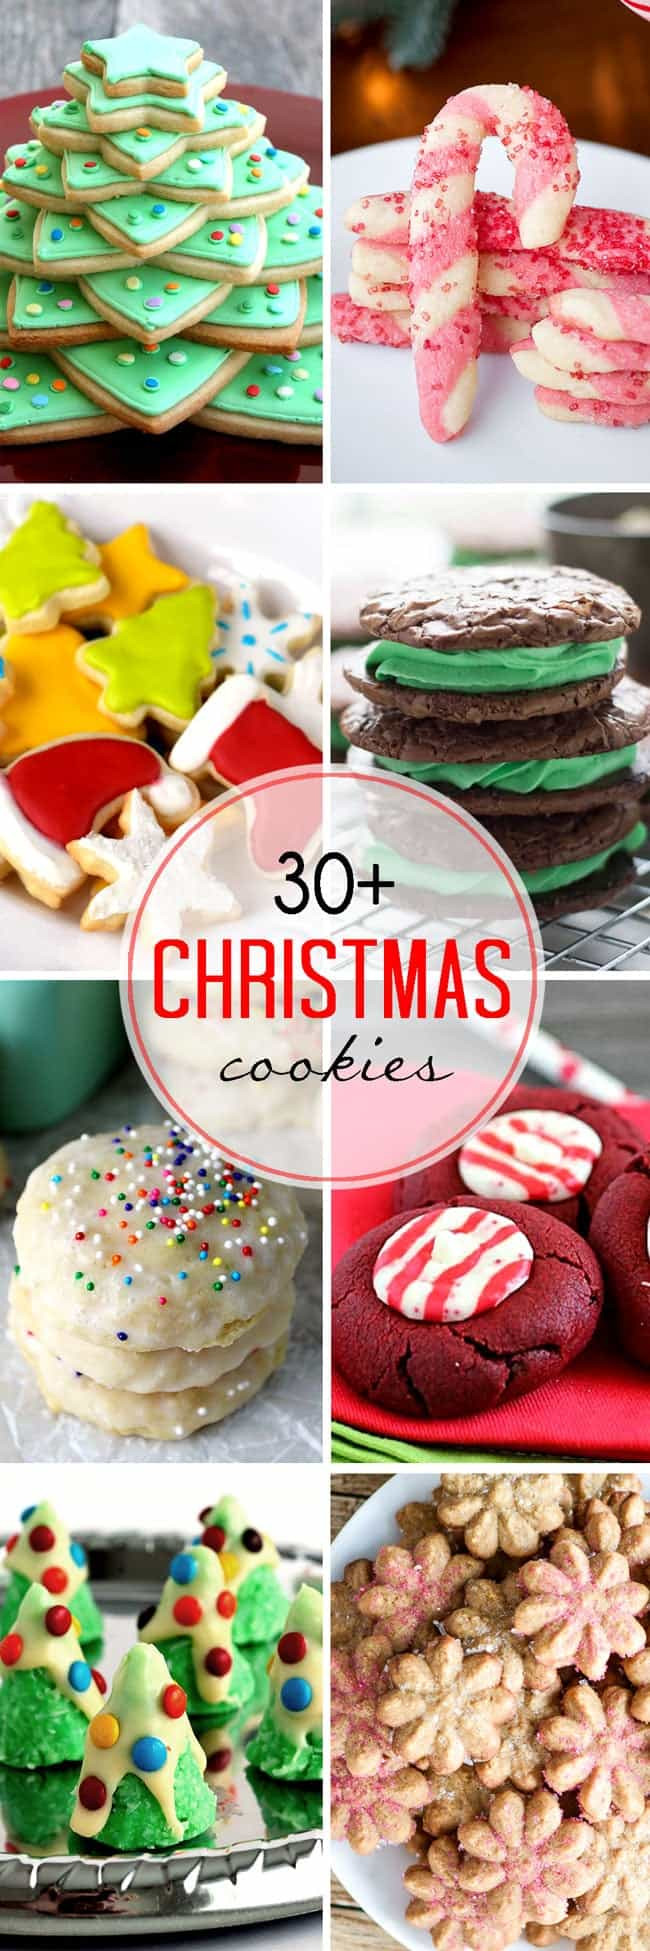 Easy Christmas Baking Ideas  30 Easy Christmas Cookies LemonsforLulu